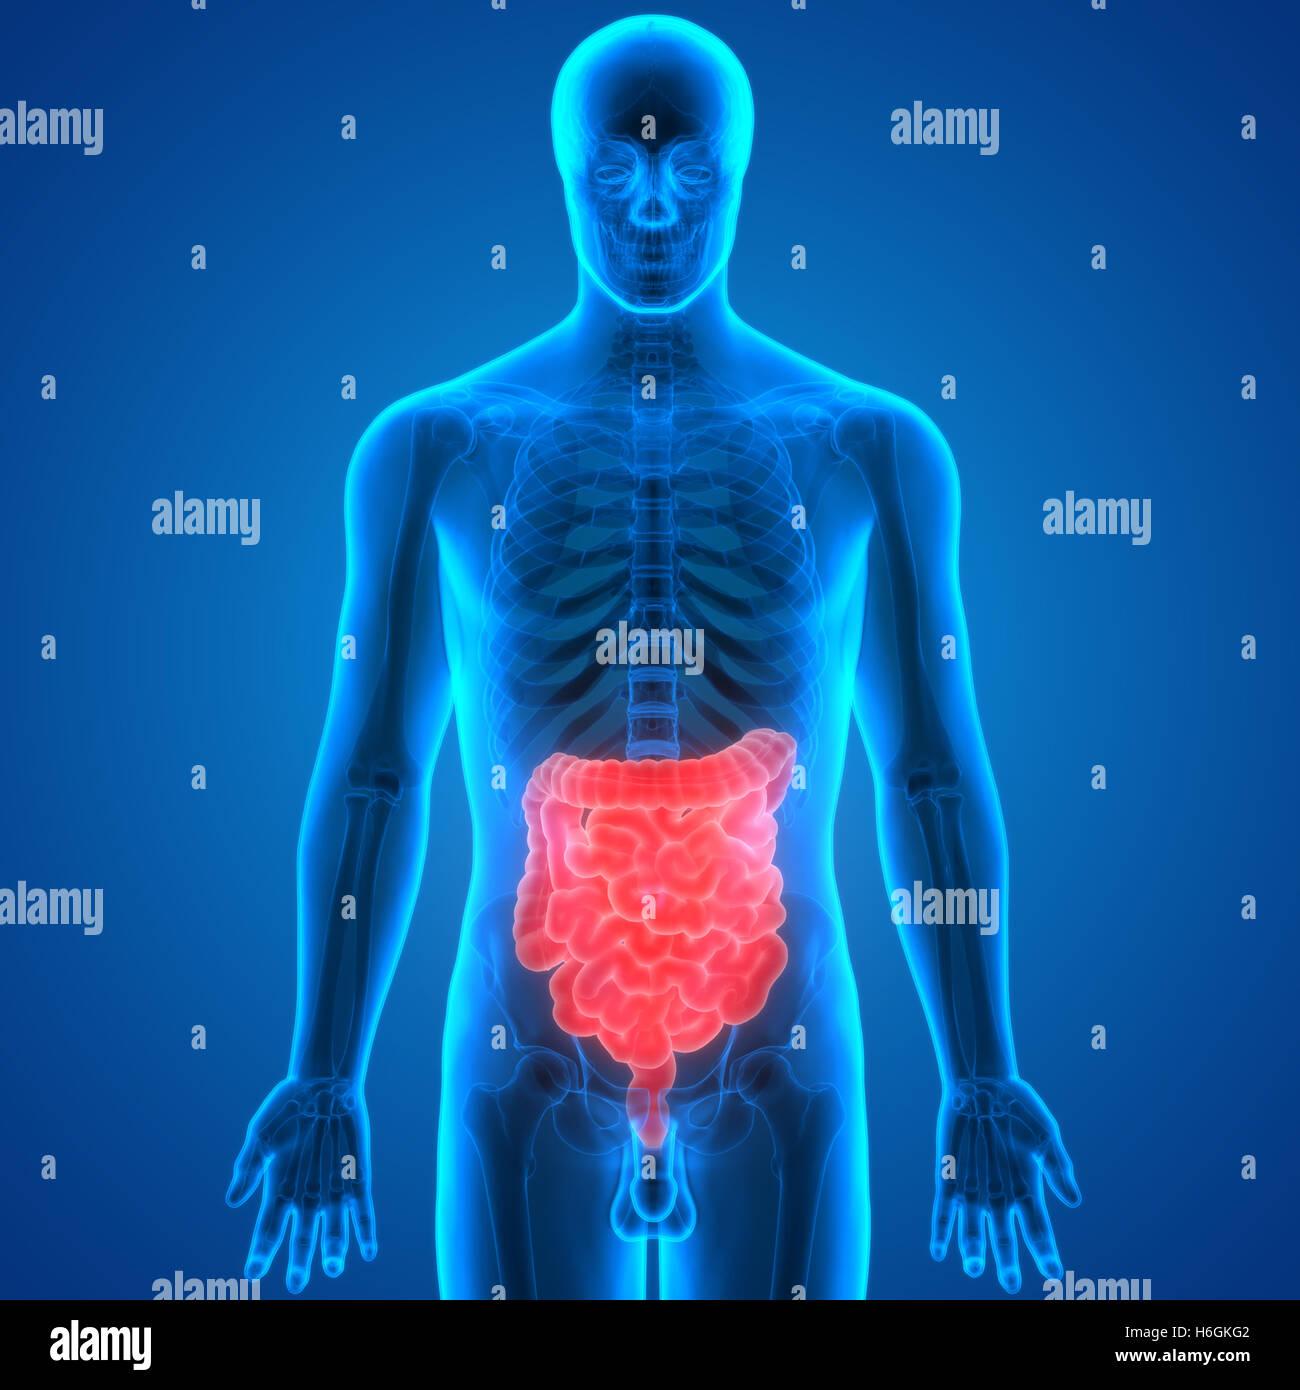 Human Large Intestine Imágenes De Stock & Human Large Intestine ...